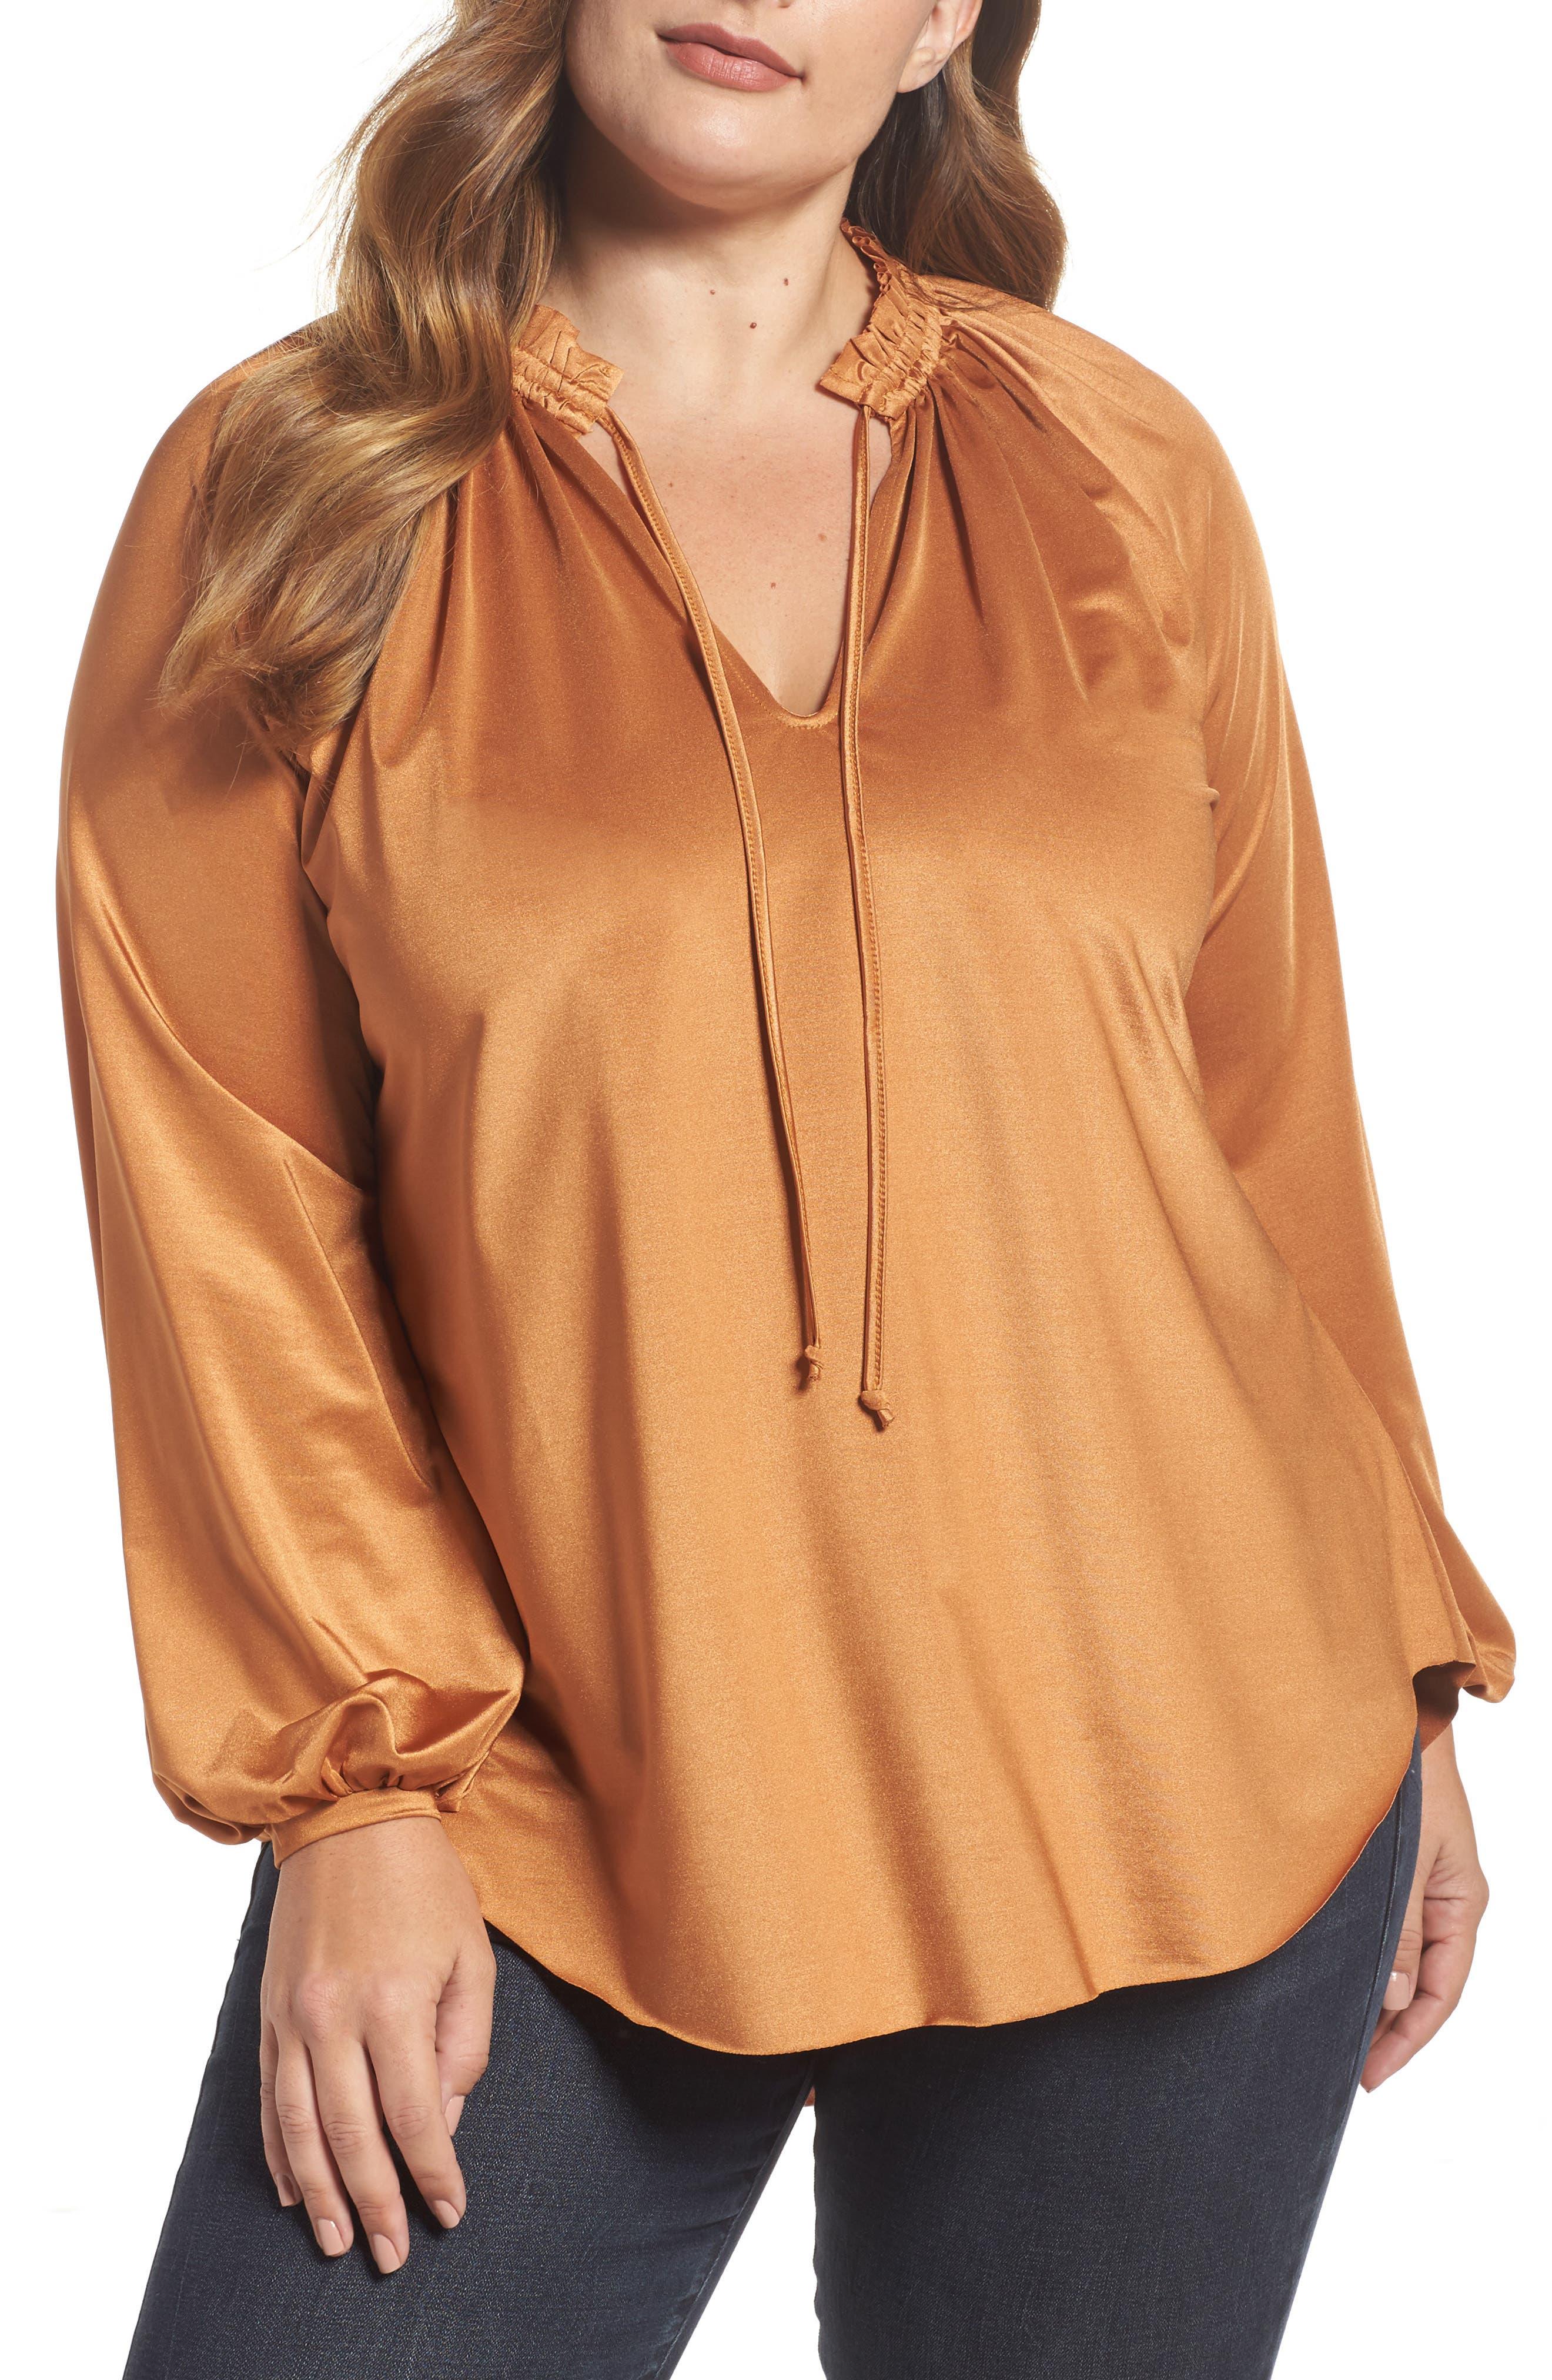 Main Image - Melissa McCarthy Tie Neck Top (Plus Size)